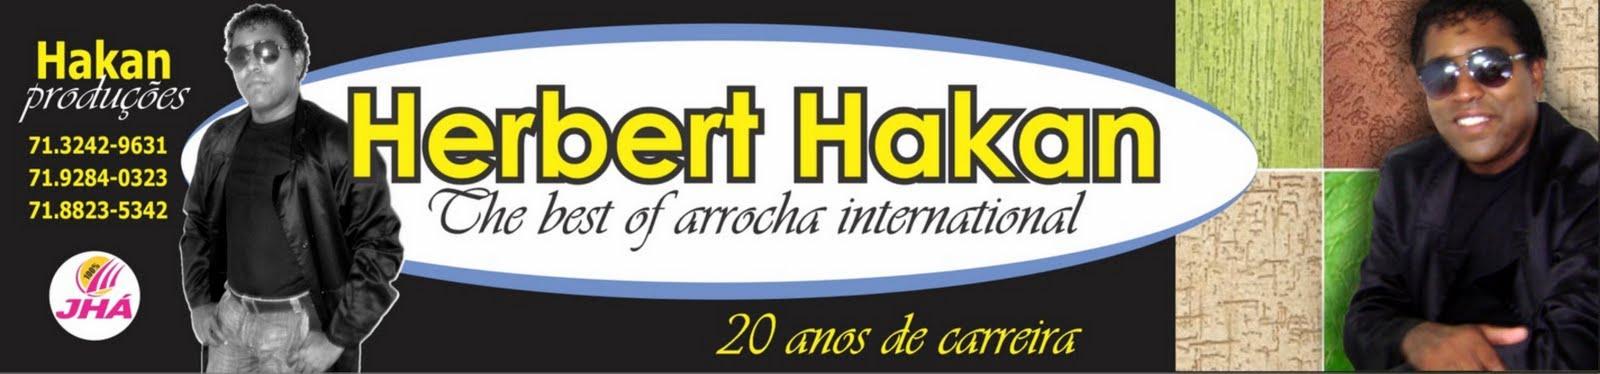 HERBERT HAKAN